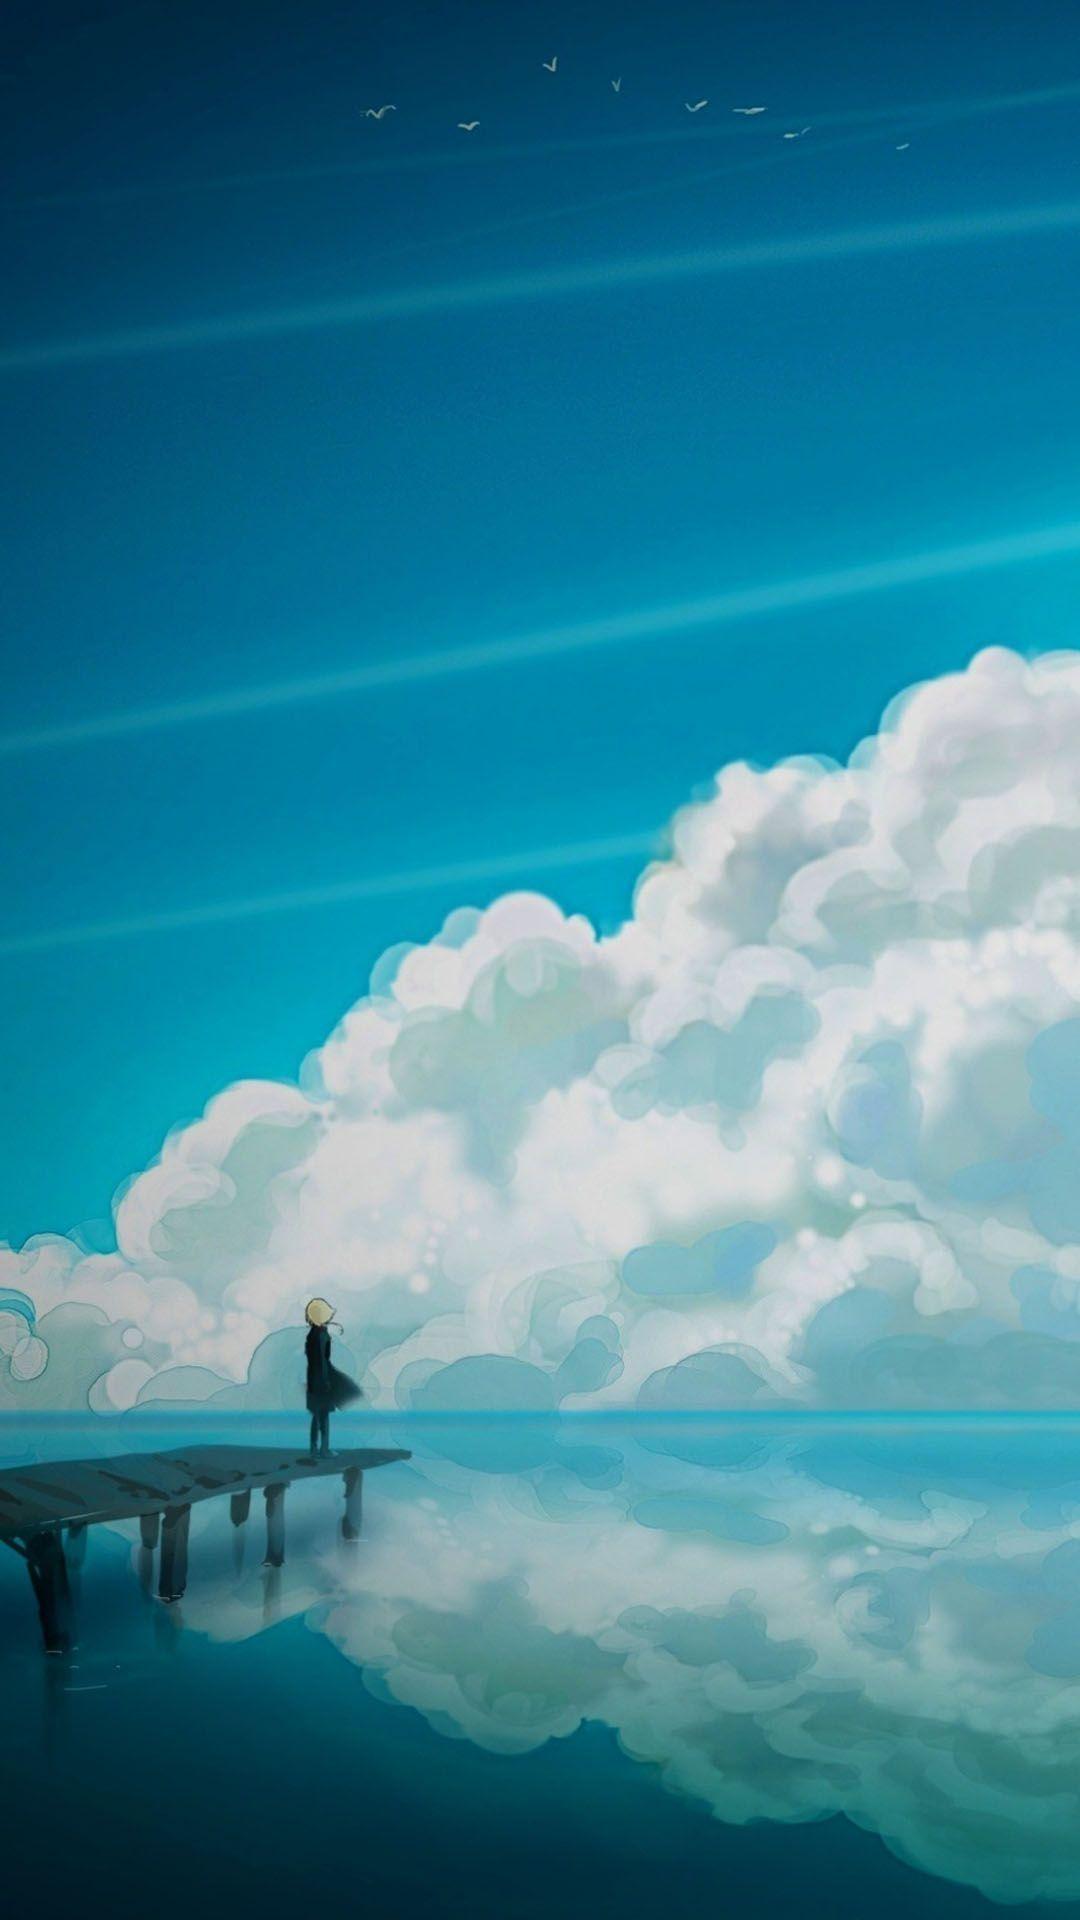 Sad Anime iOS 8 wallpaper